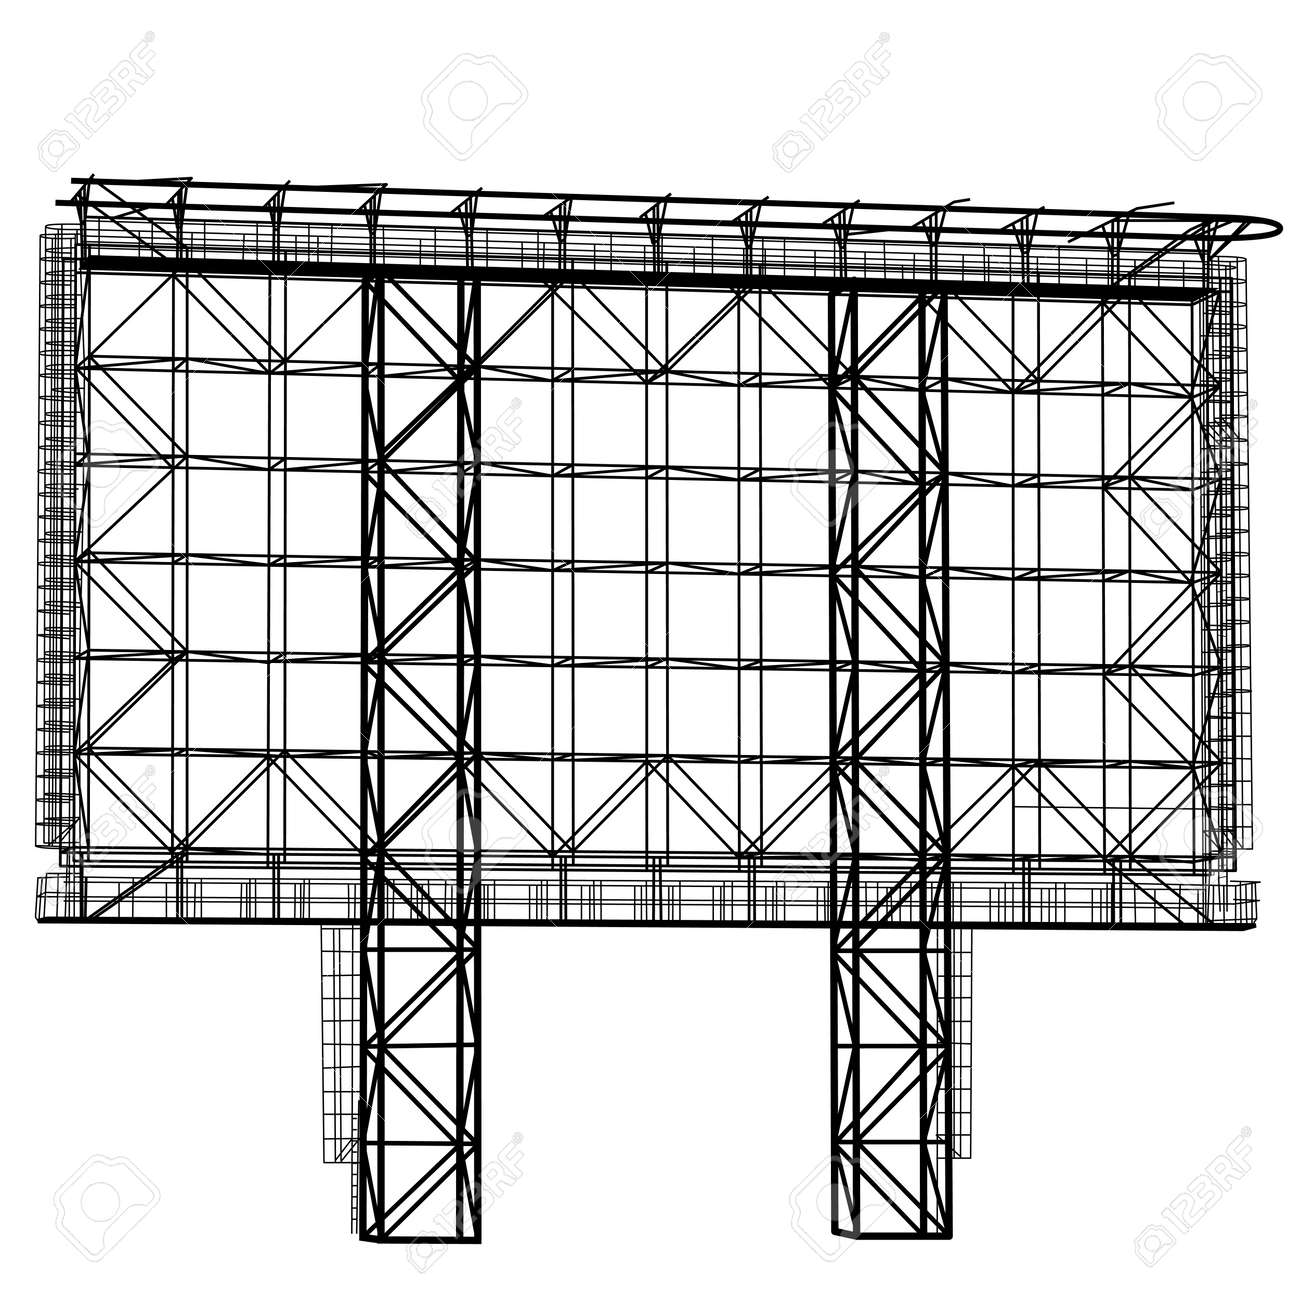 Silhouette of Steel structure billboard. Vector illustration. - 45909602